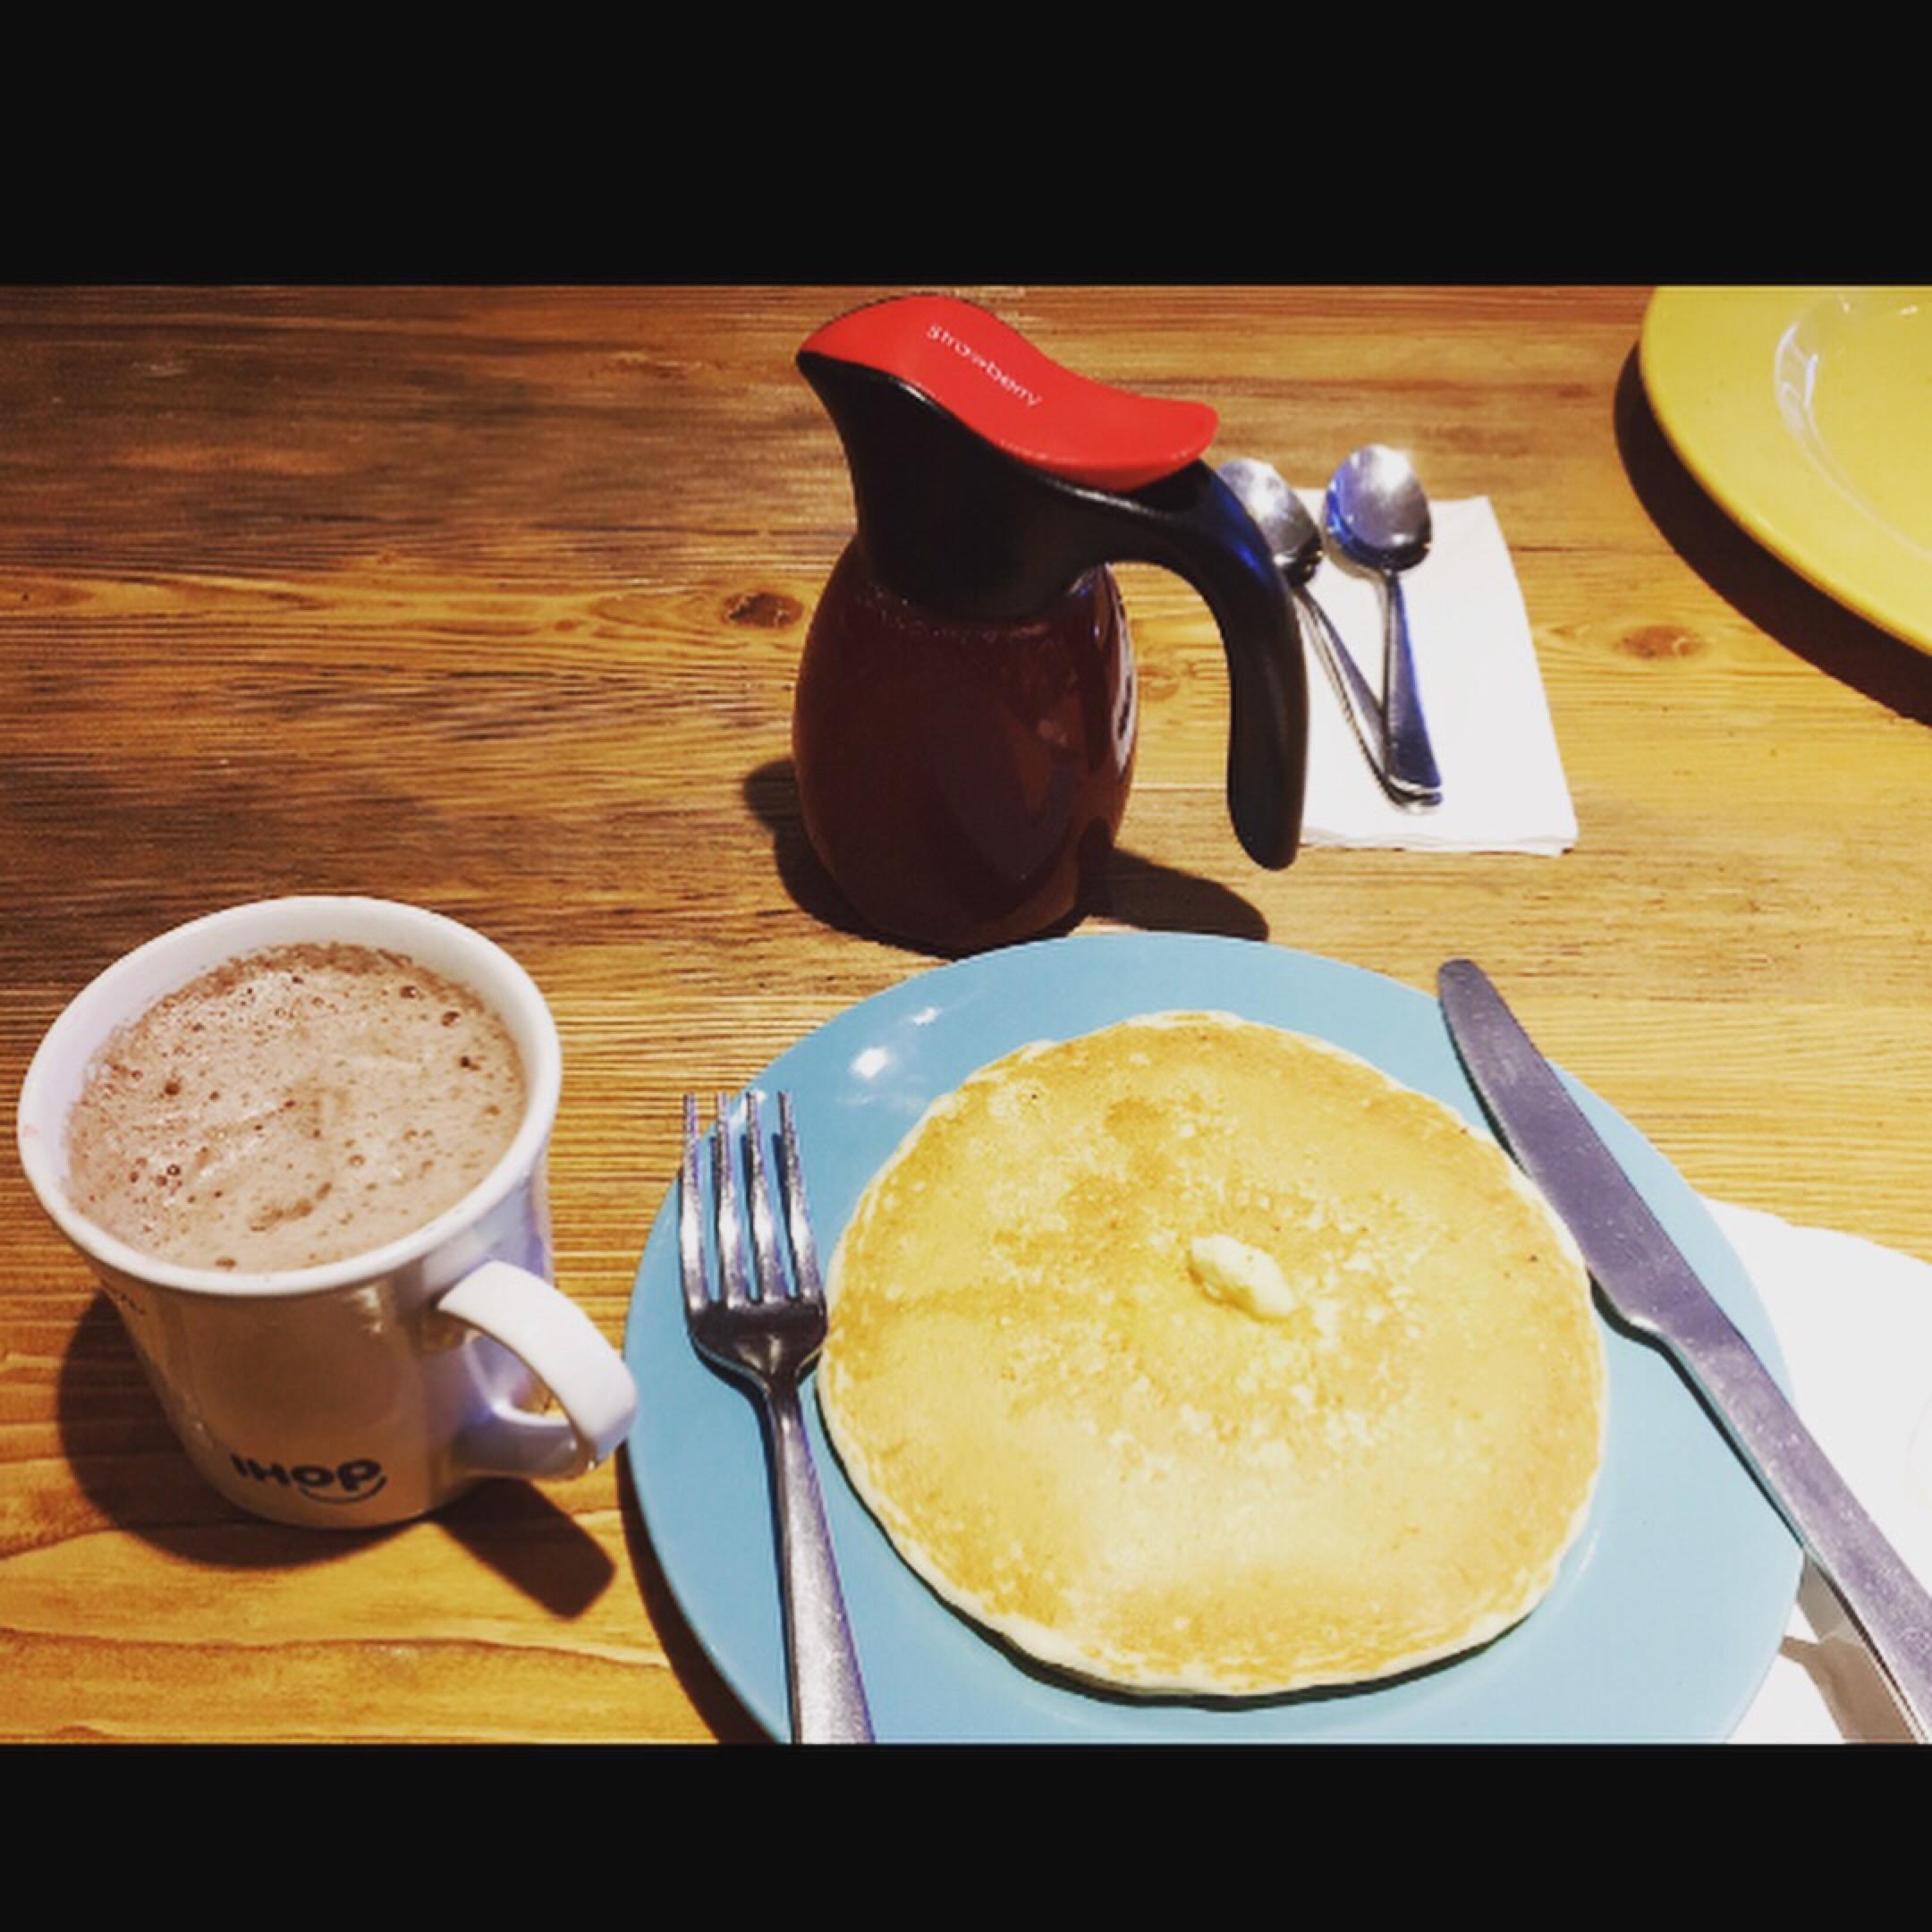 My kind of breakfast! 🥞😋 #breakfast #pancakes #coffee #lifestyleblogger #createbrain